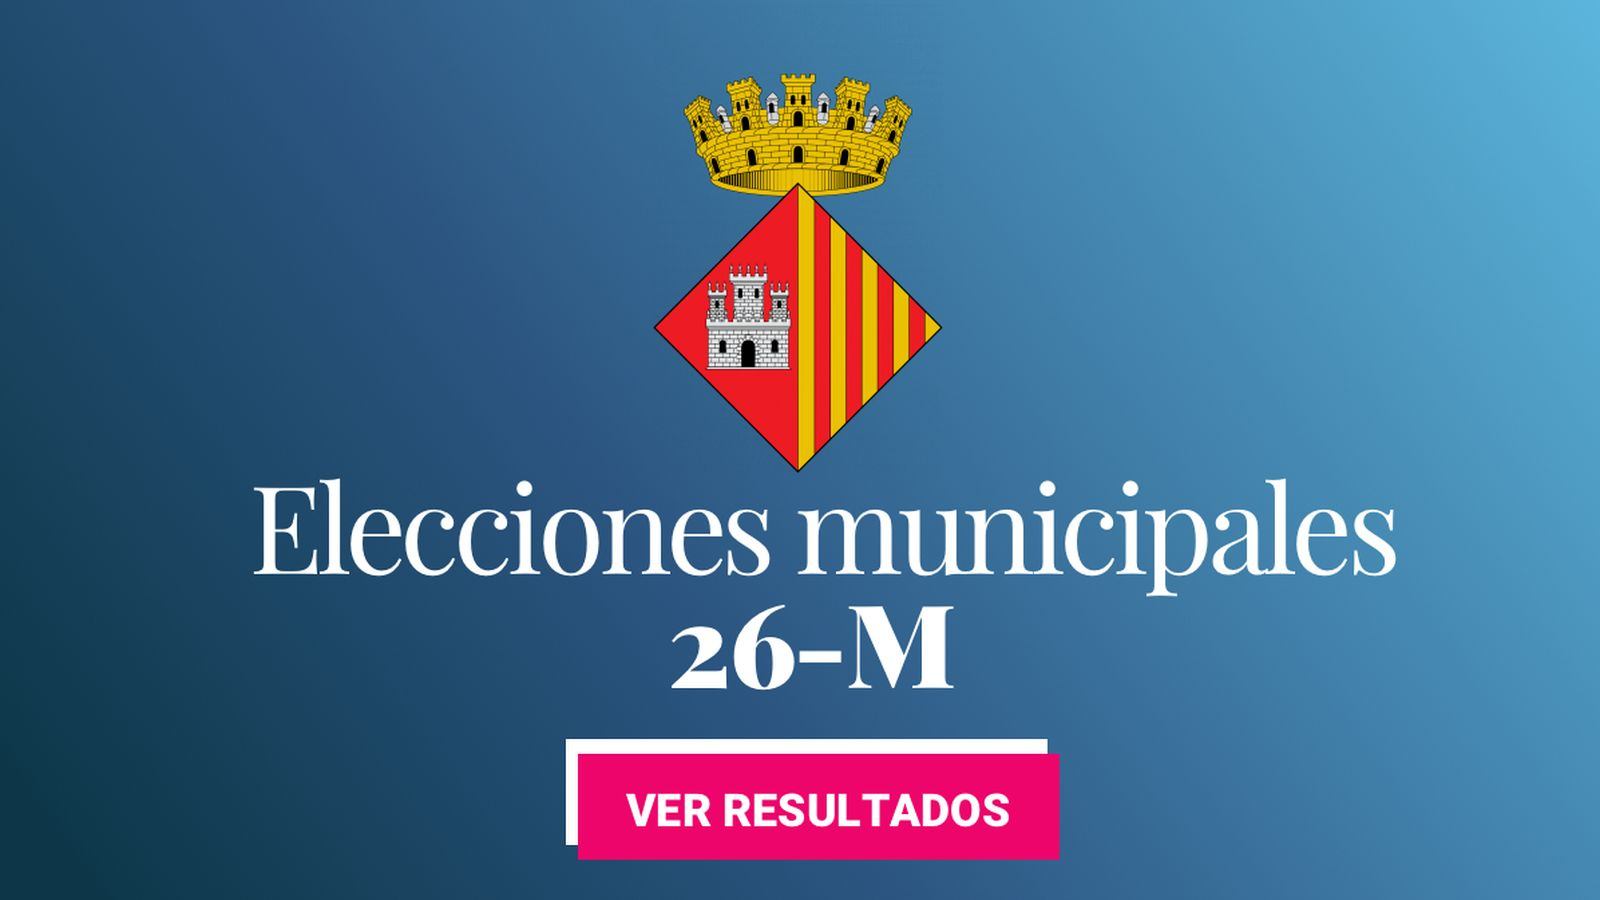 Foto: Elecciones municipales 2019 en Terrassa. (C.C./EC)